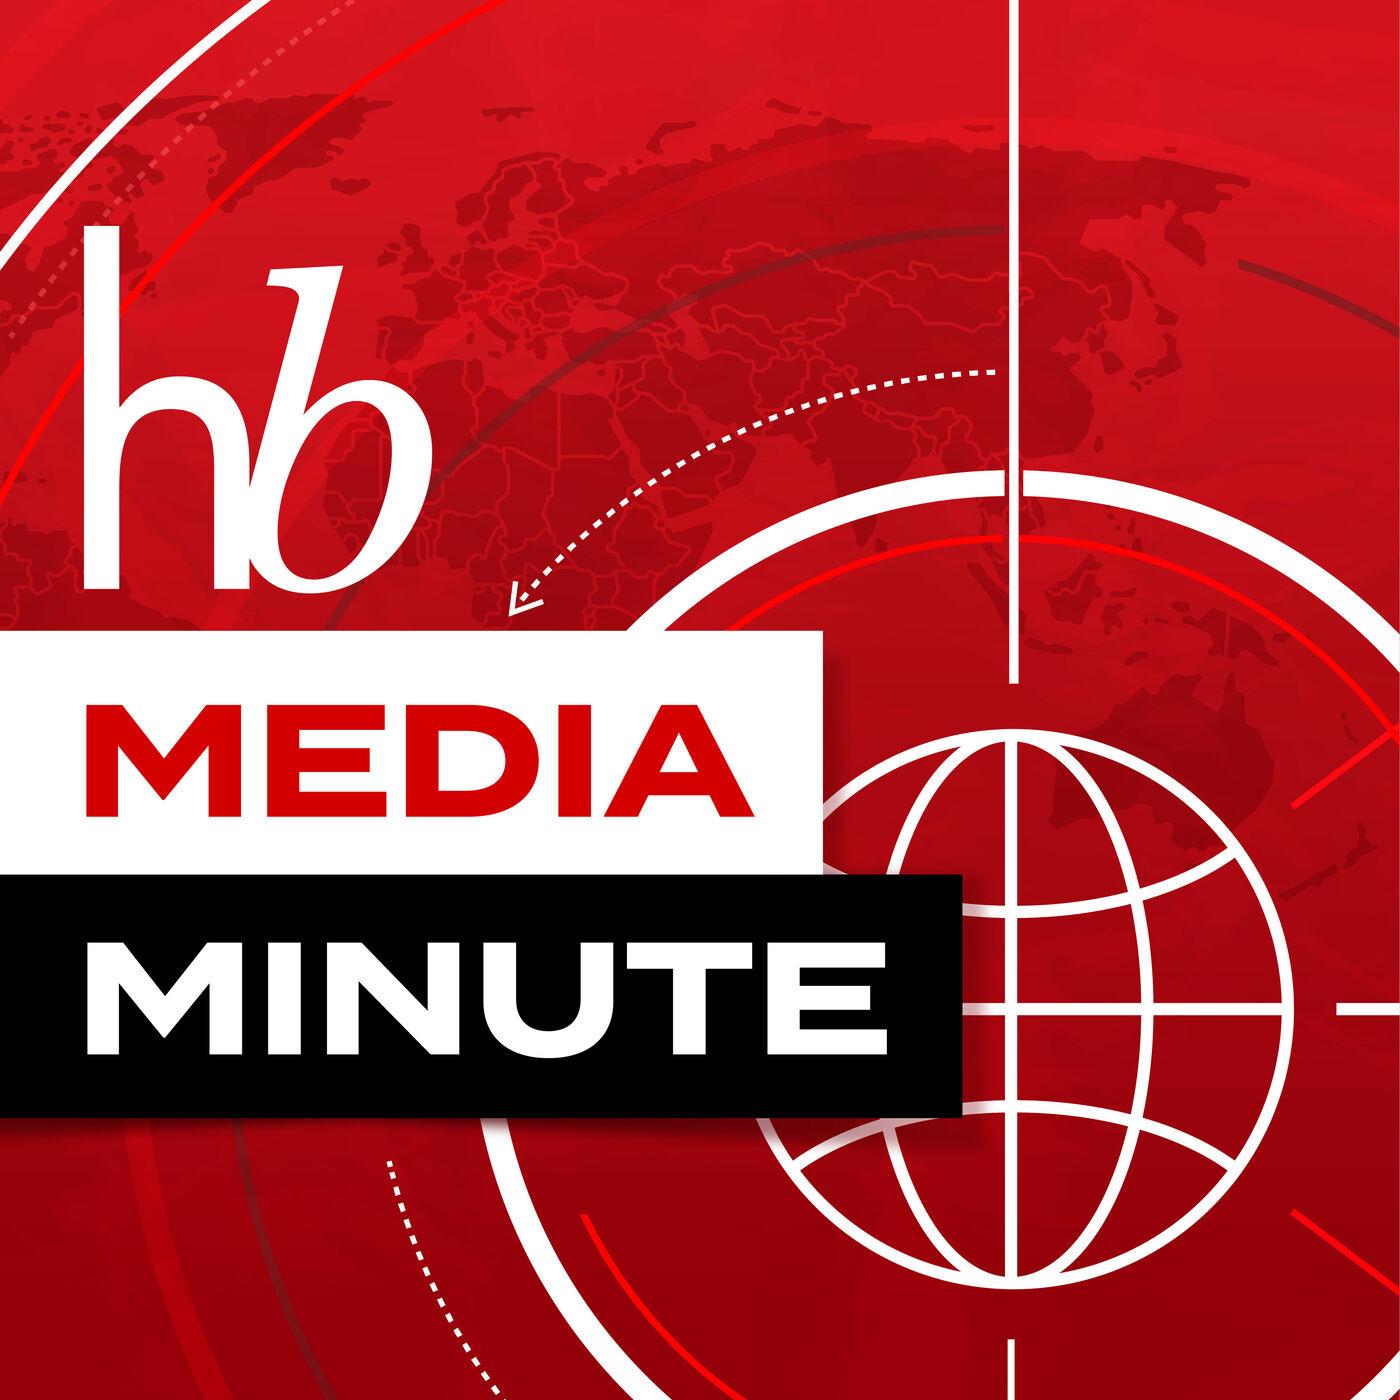 HB Media Minute - Anti-SLAPP Legislation and Litigation - Key Developments